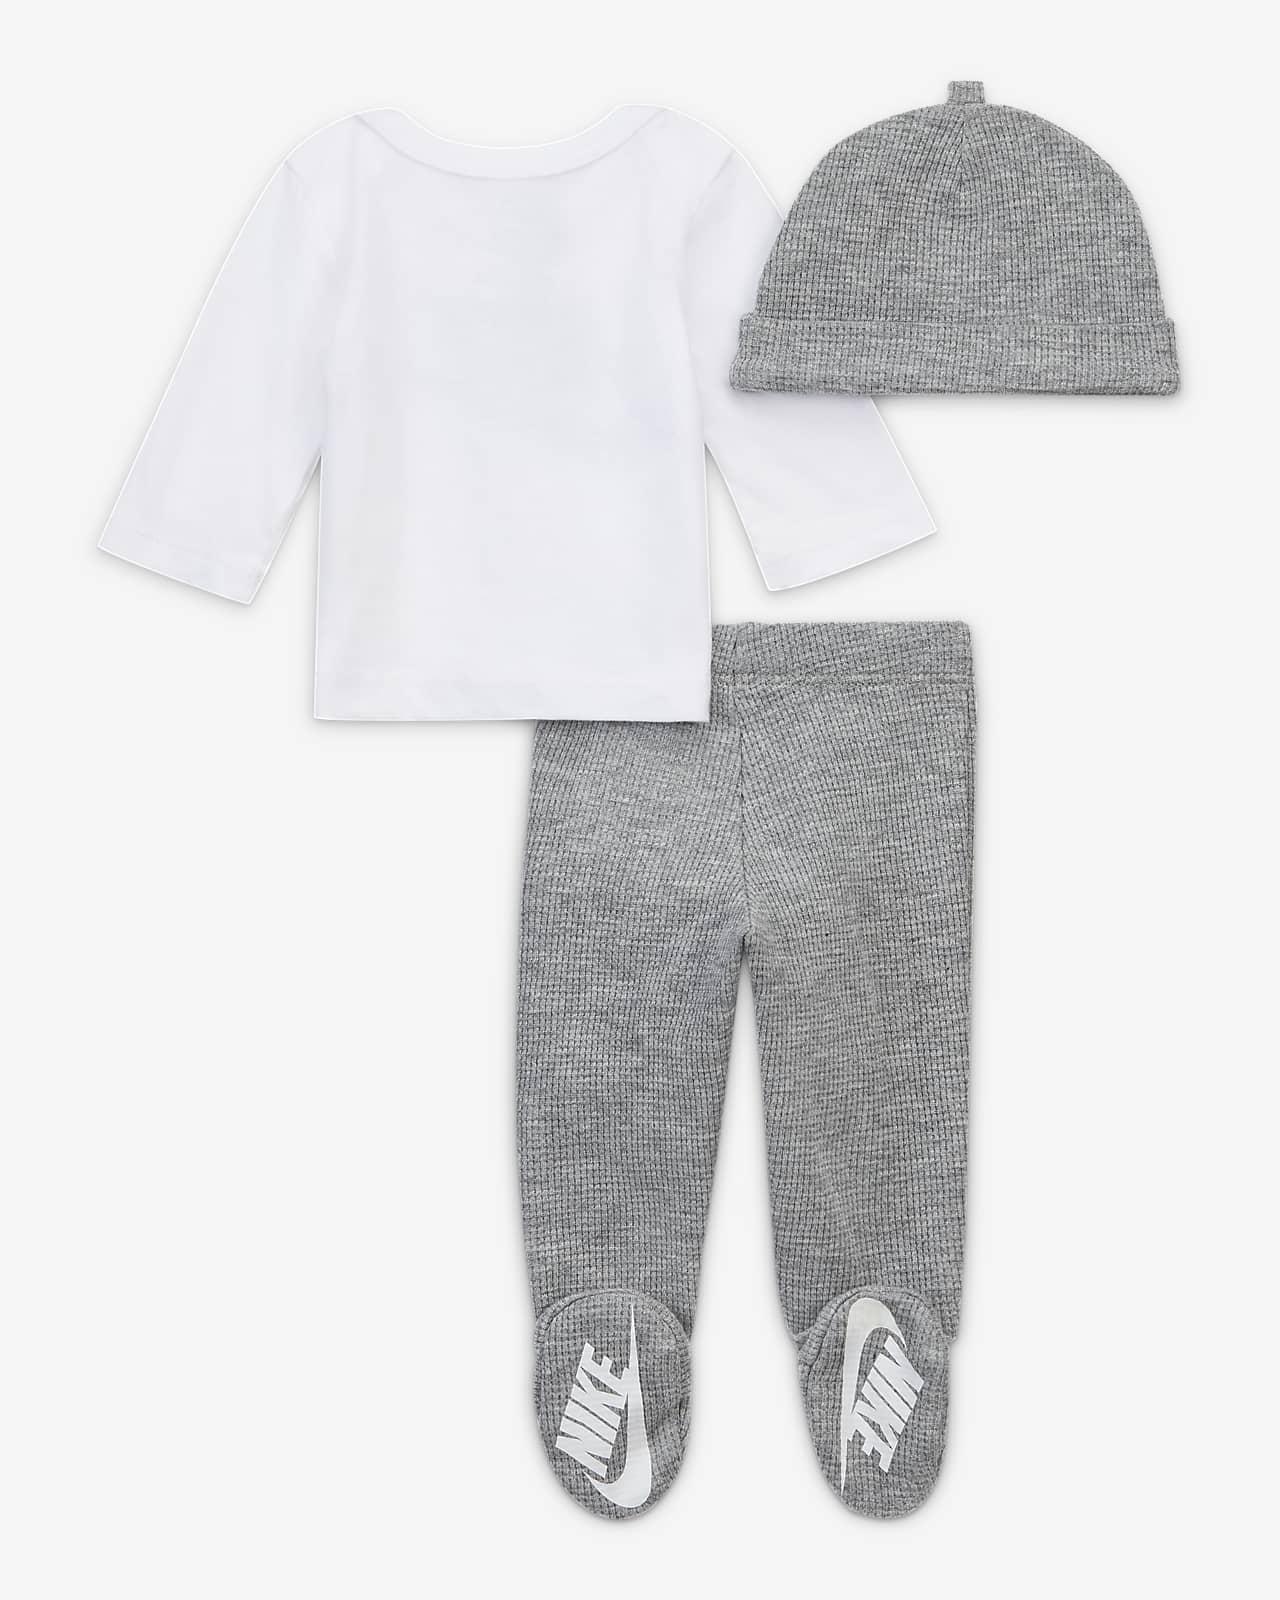 Nike Baby (Preemie) T-Shirt, Footed